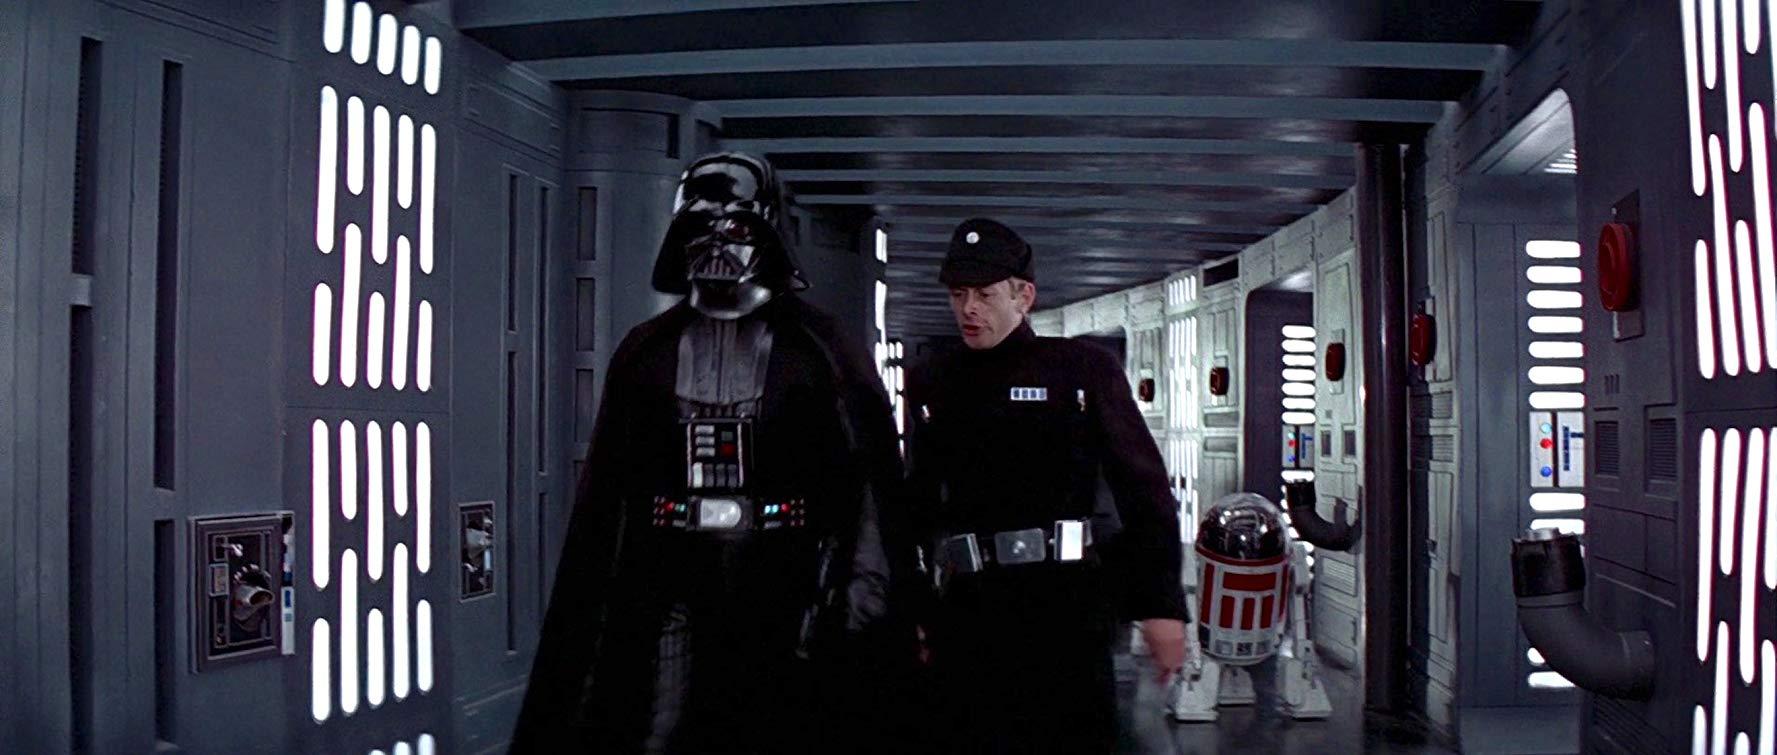 Nero DISNEY Star Wars giovani BOXER doposcuola Darth Vader con Spada Laser